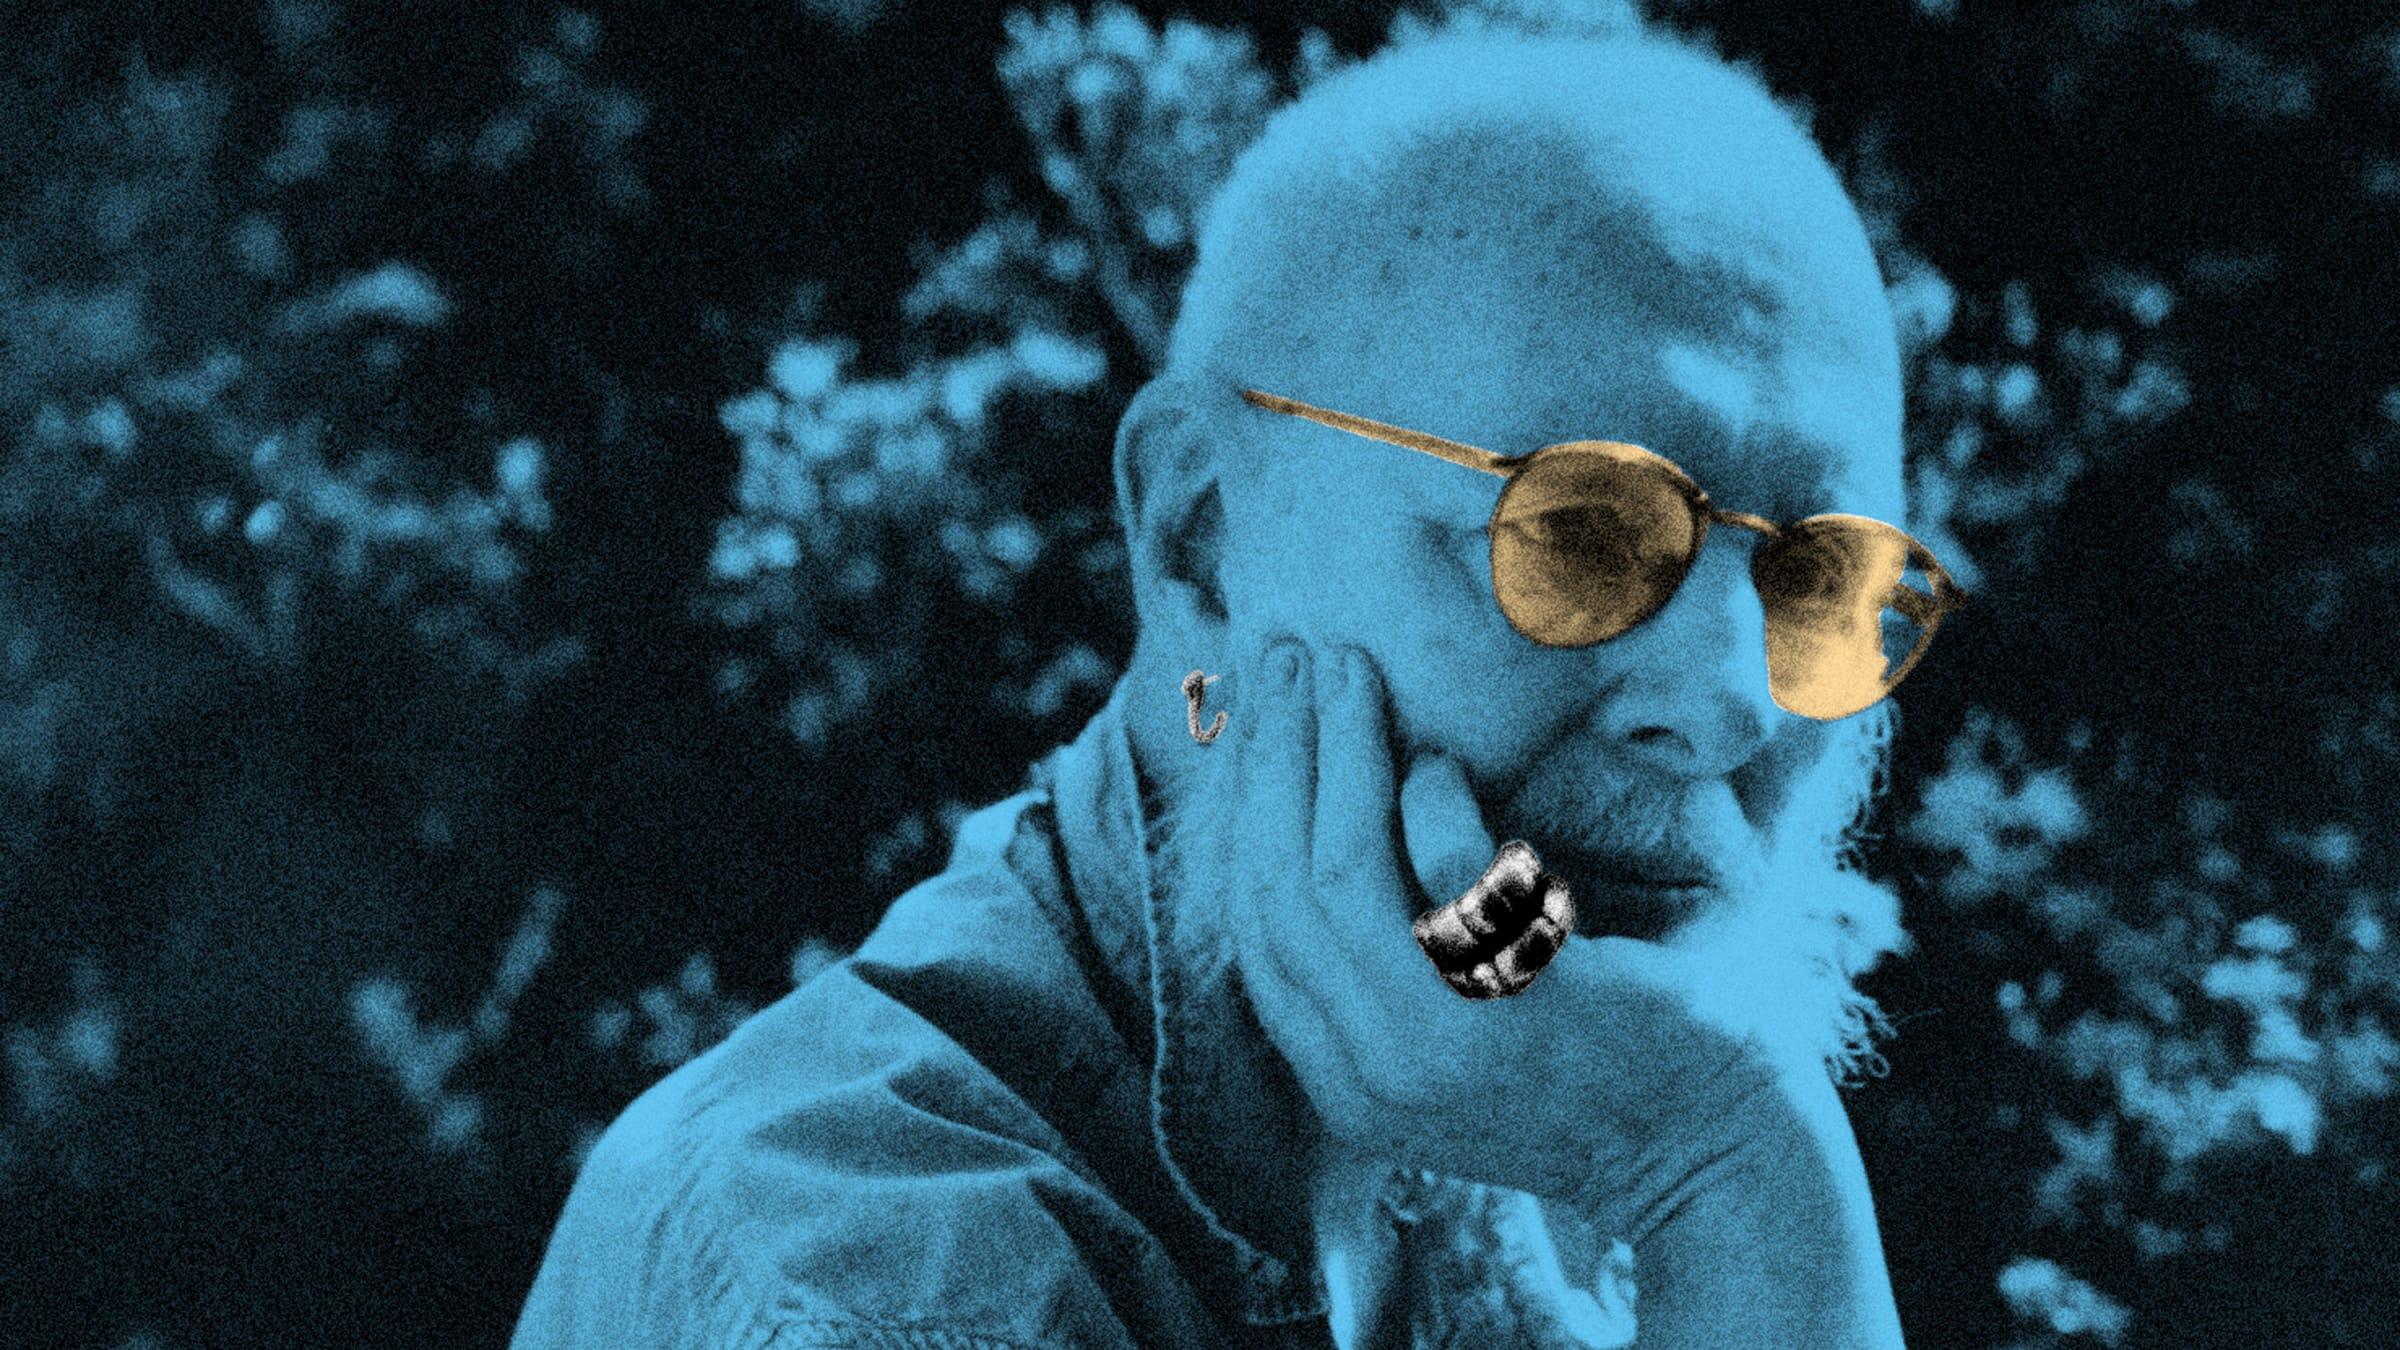 Edward Gorey Wore the Weirdest, Wackiest Jewels